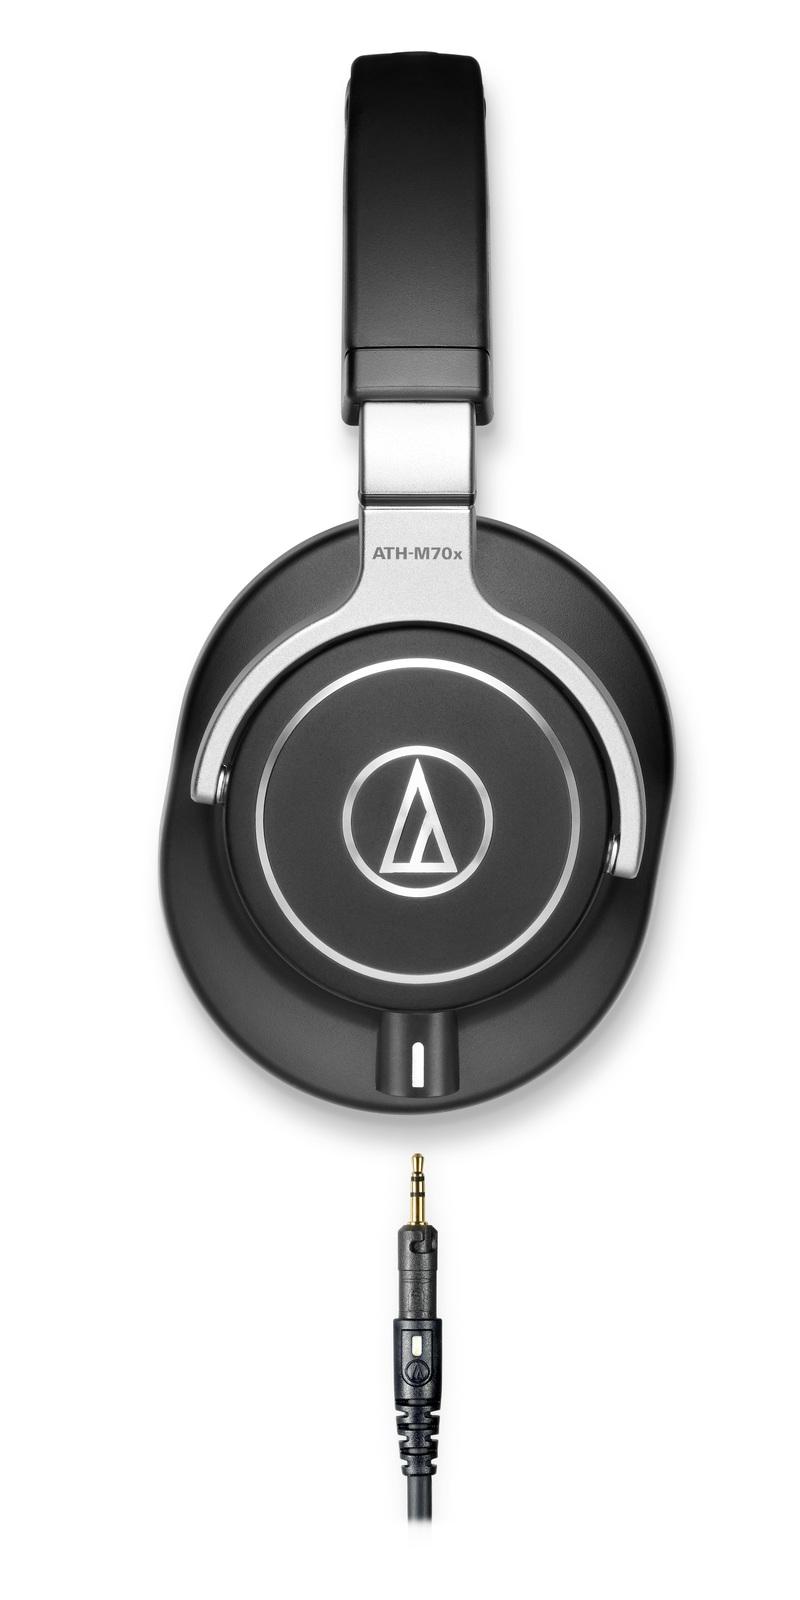 ATH-M70x Professional - Monitor Headphones image